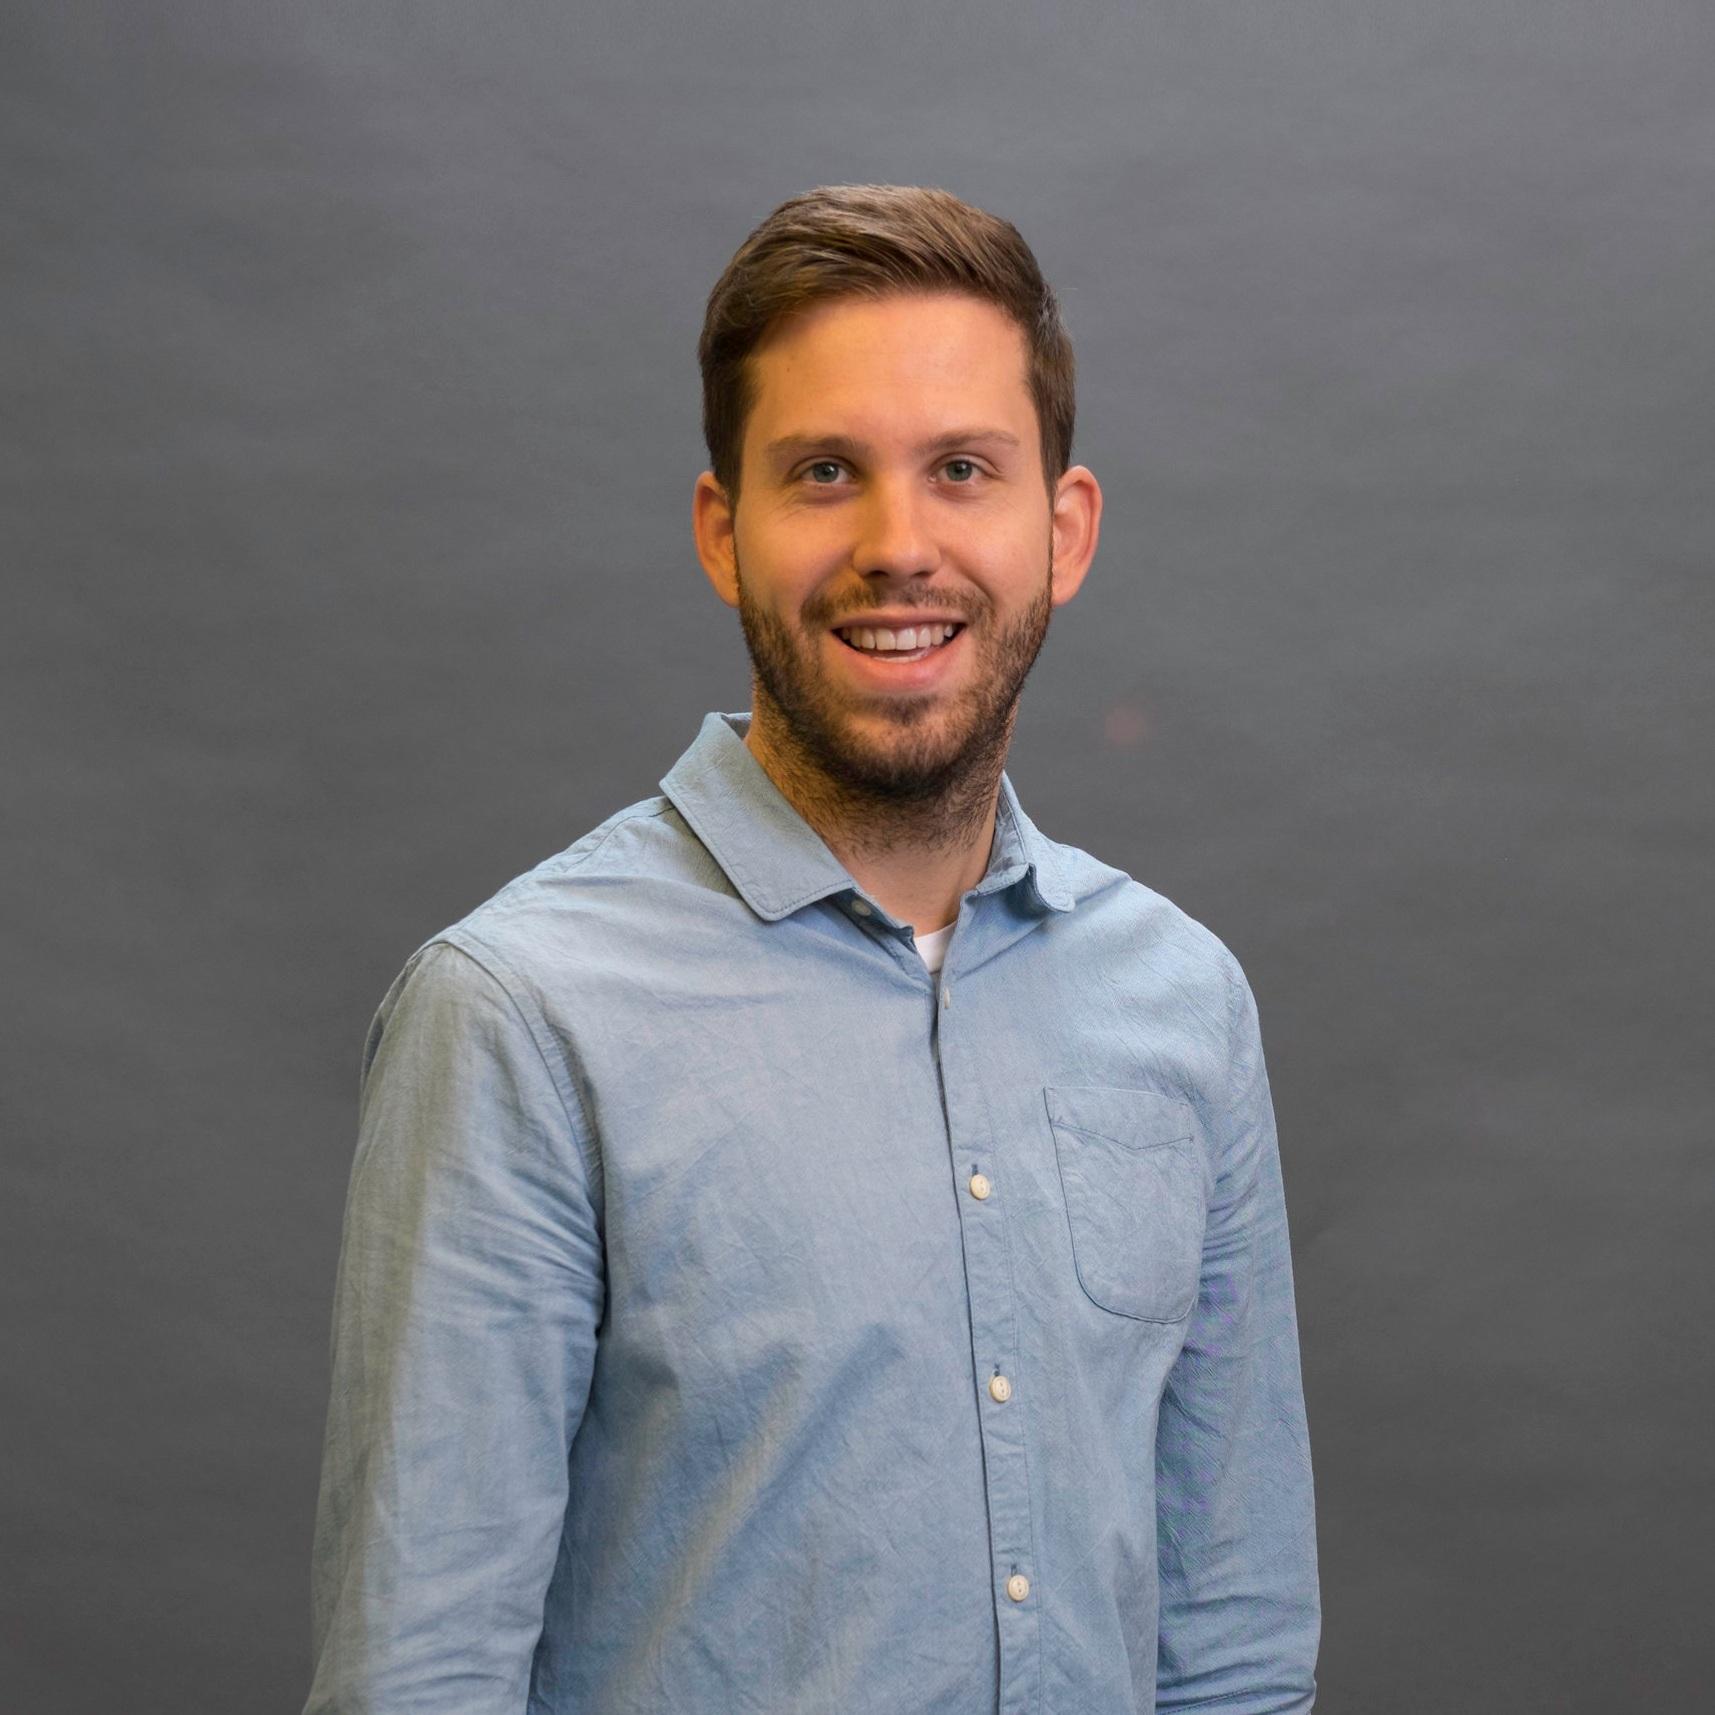 Jakob Zehentner - T: +43 6272 5562 36